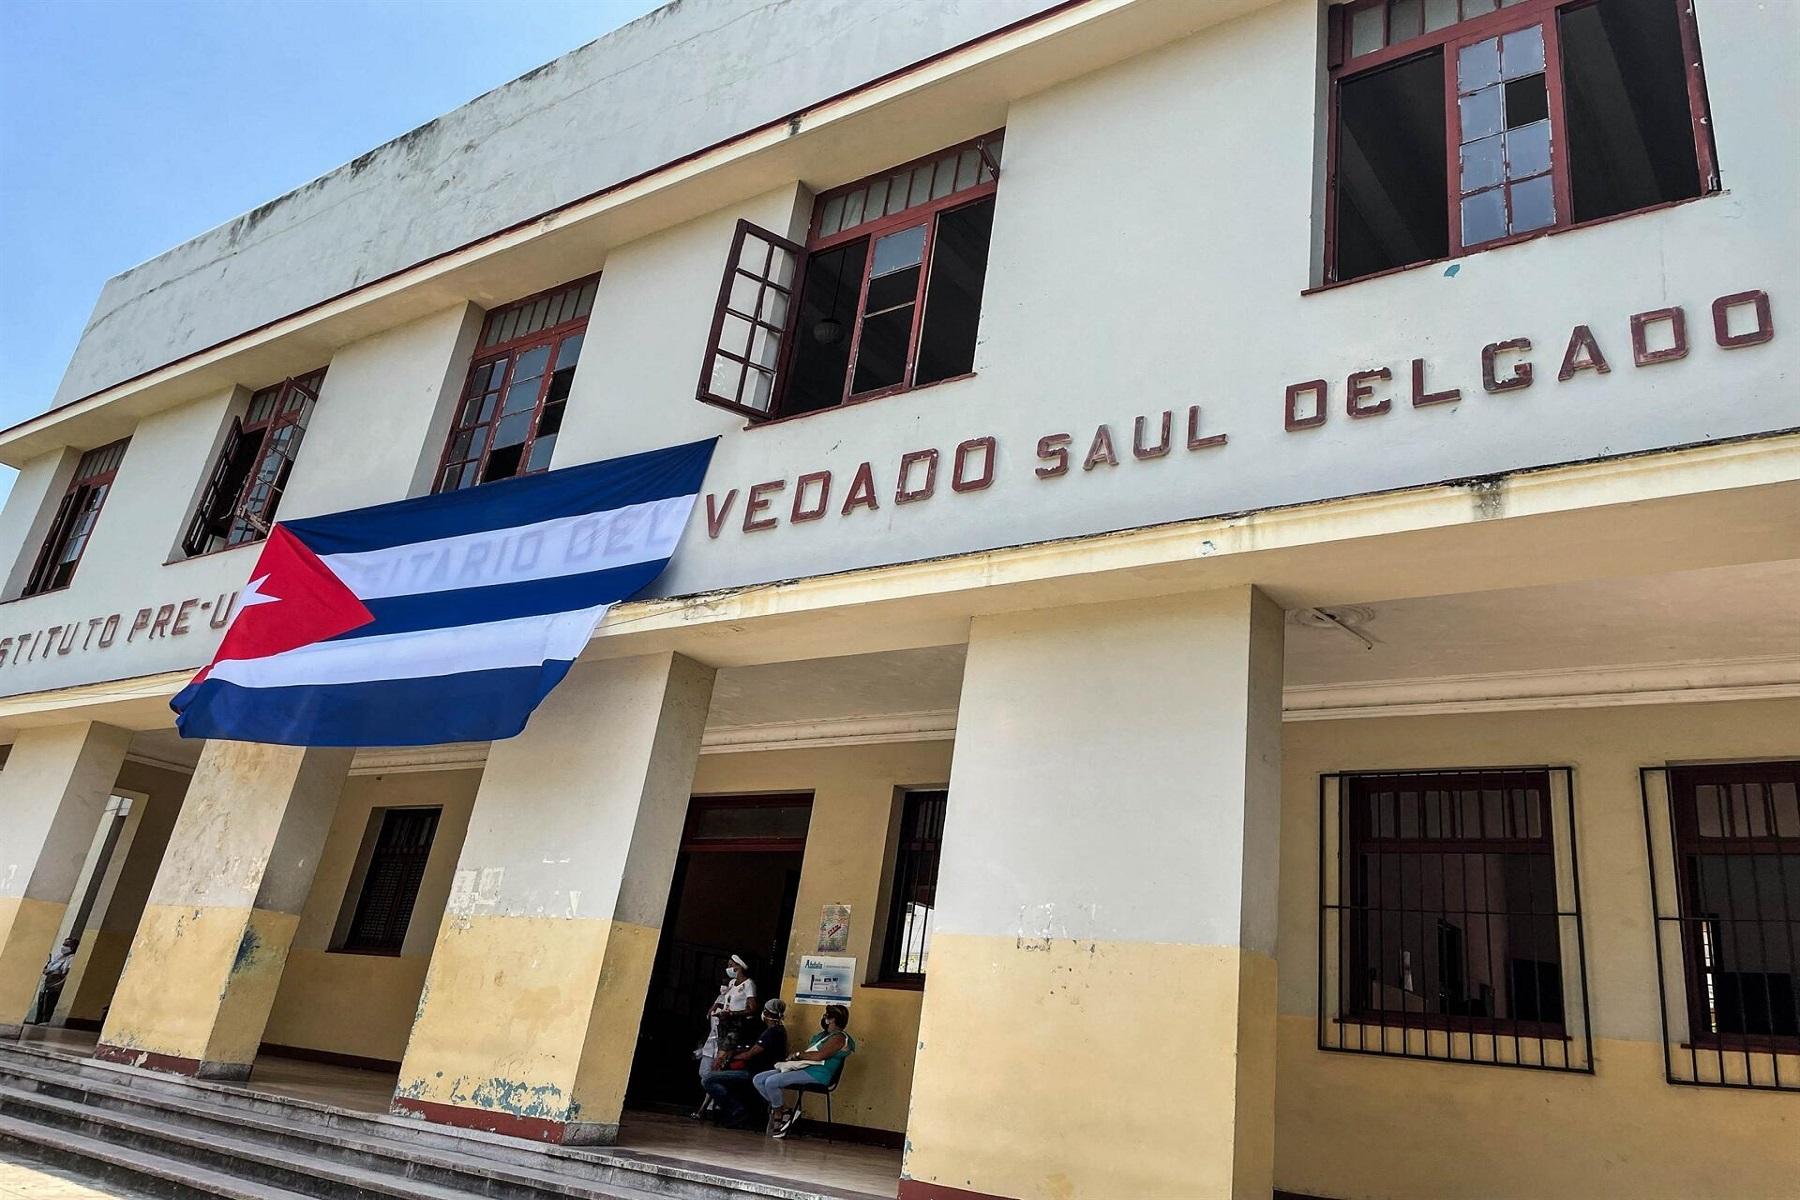 Covid Κούβα: Ξεκινά τον εμβολιασμό των παιδιών προκειμένου να ανοίξει ξανά τα σχολεία εν μέσω της έξαρσης της λοίμωξης